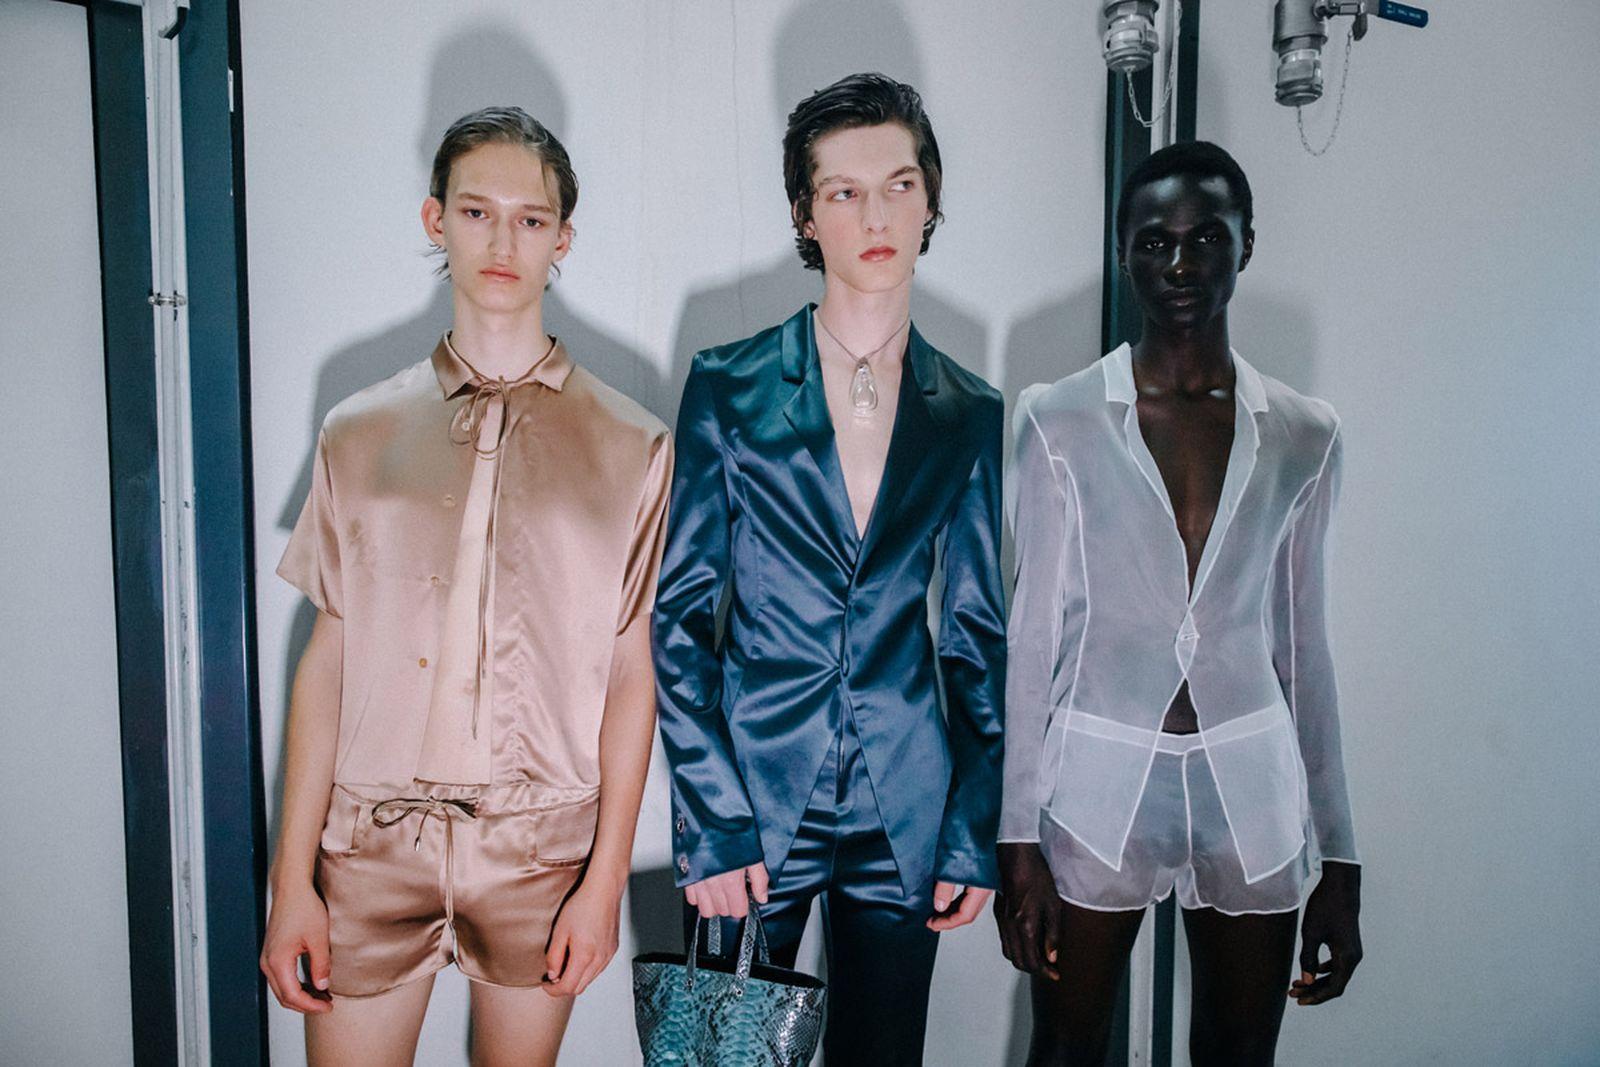 MSS20 Paris Ludovic de Saint Sernin Julien Tell For Web 01 paris fashion week runway